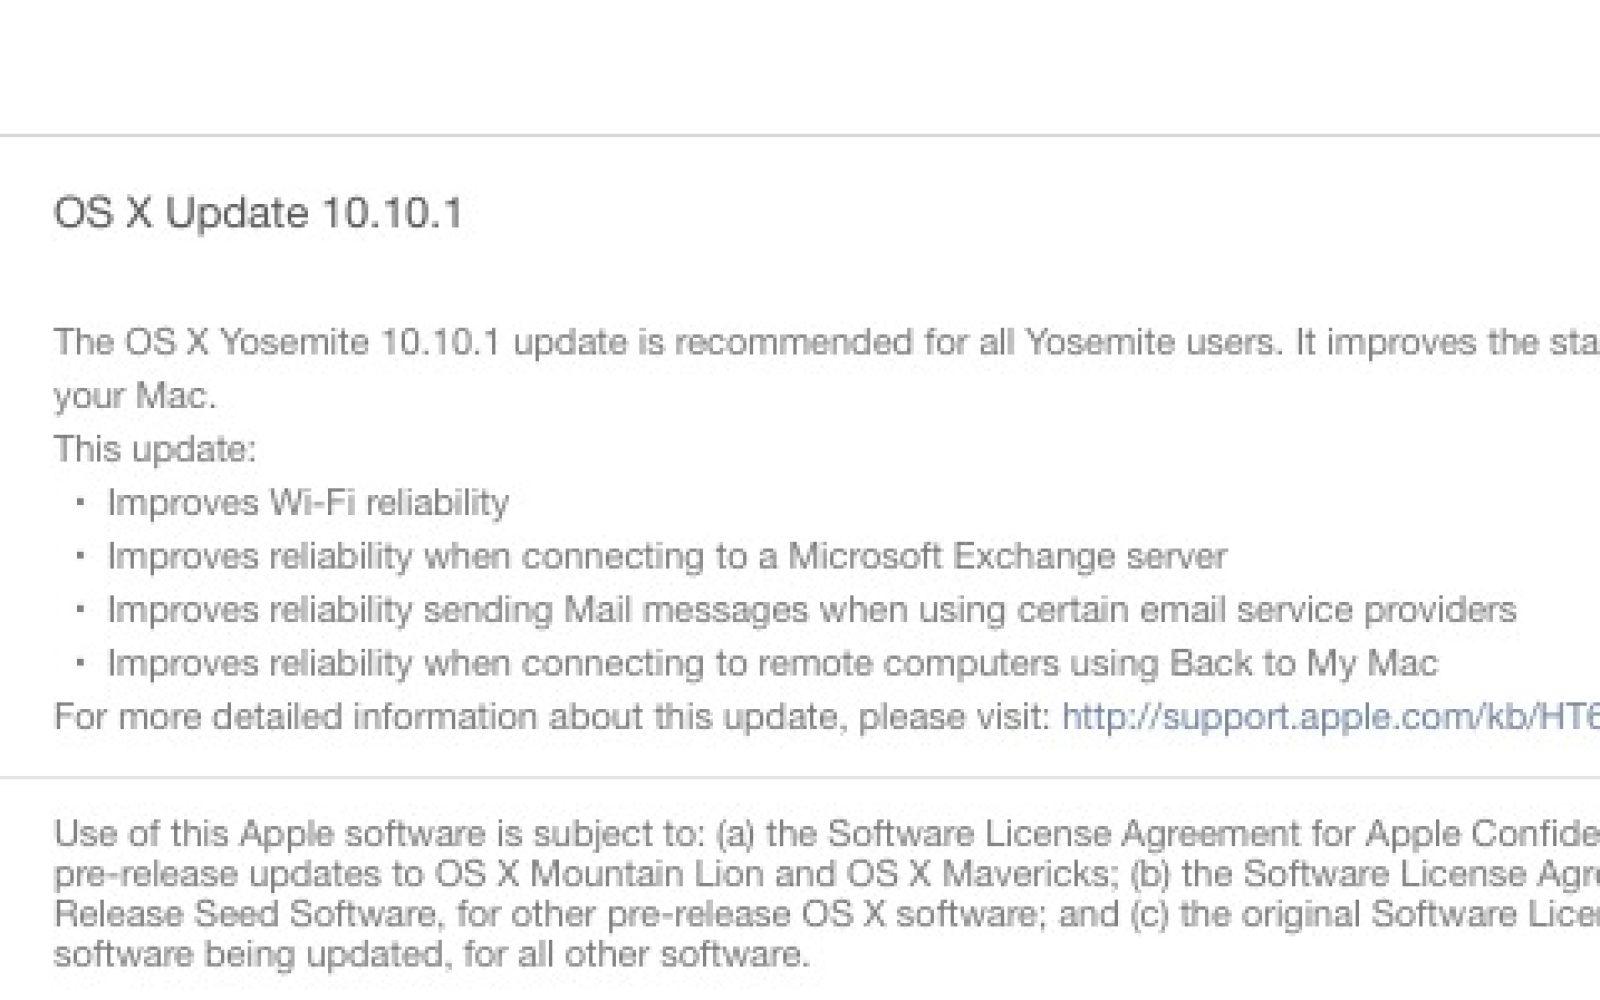 Apple releases OS X Yosemite 10 10 1 w/ bug fixes & WiFi